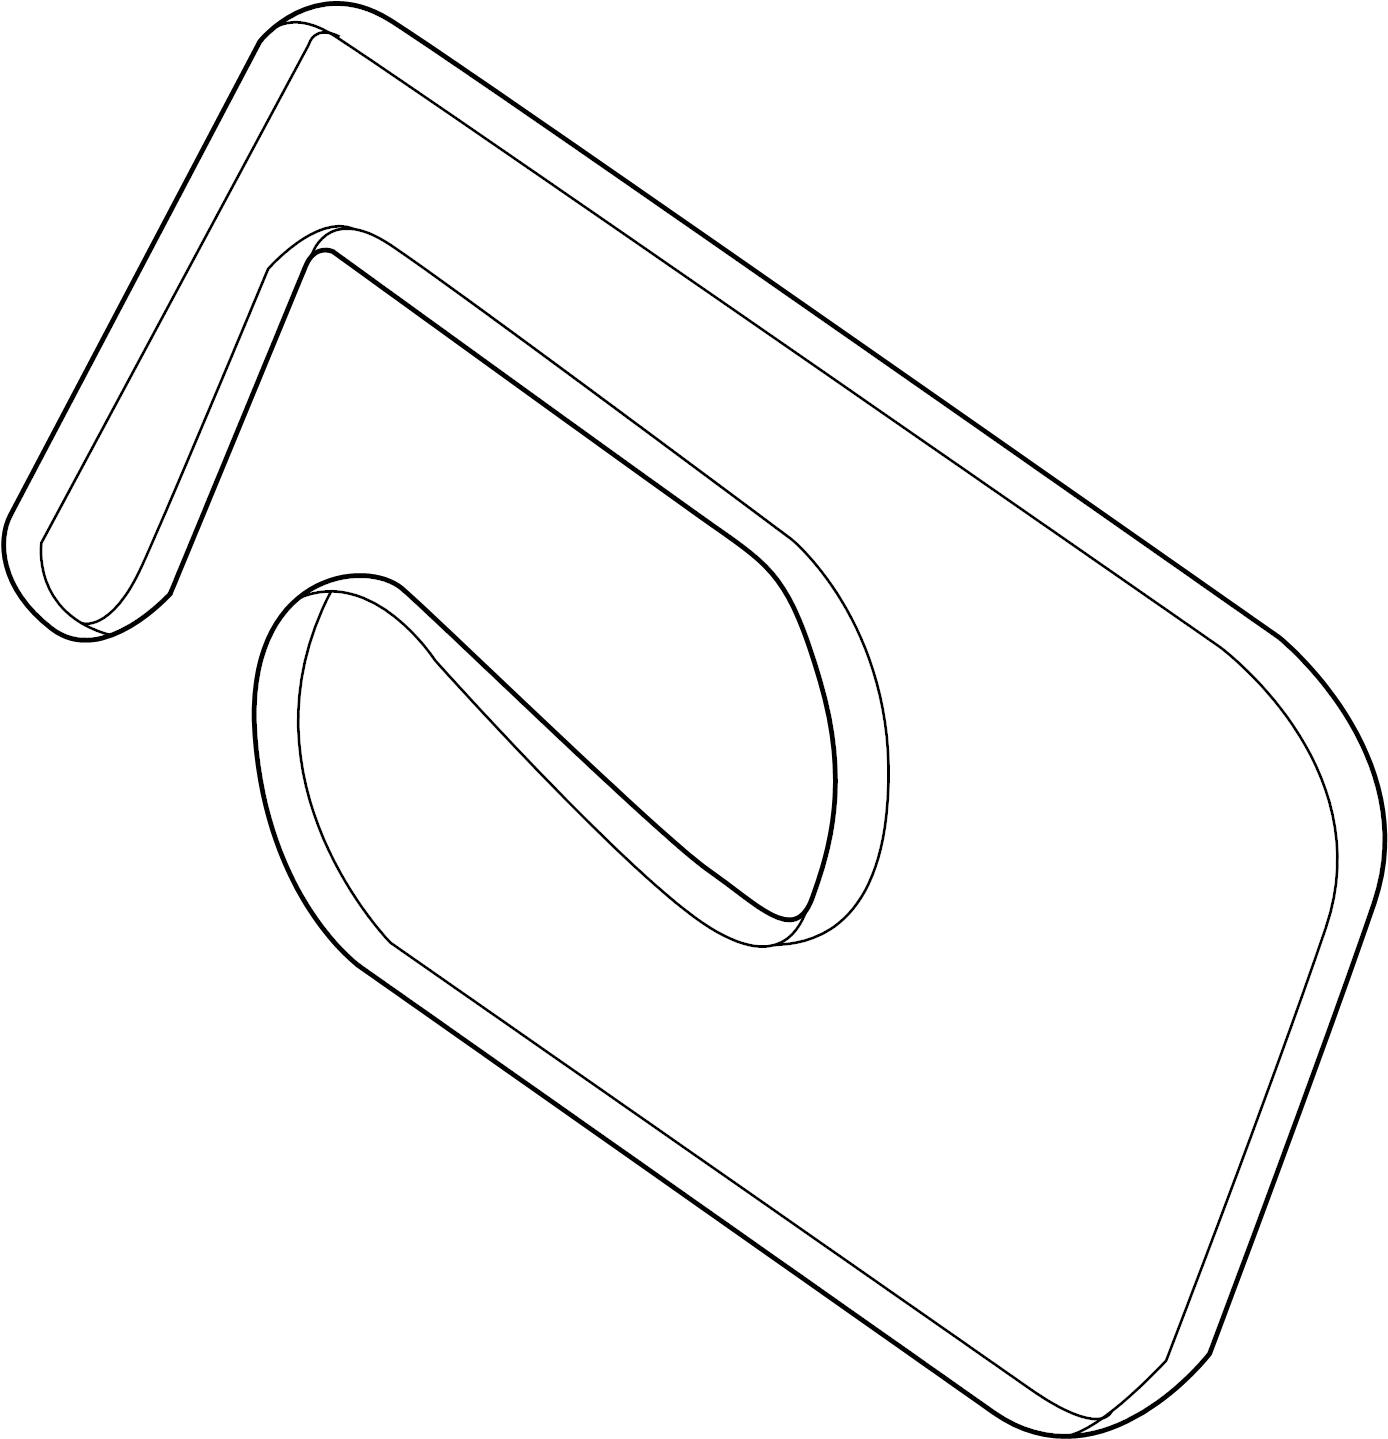 2011 mercedes-benz s550 serpentine belt  v